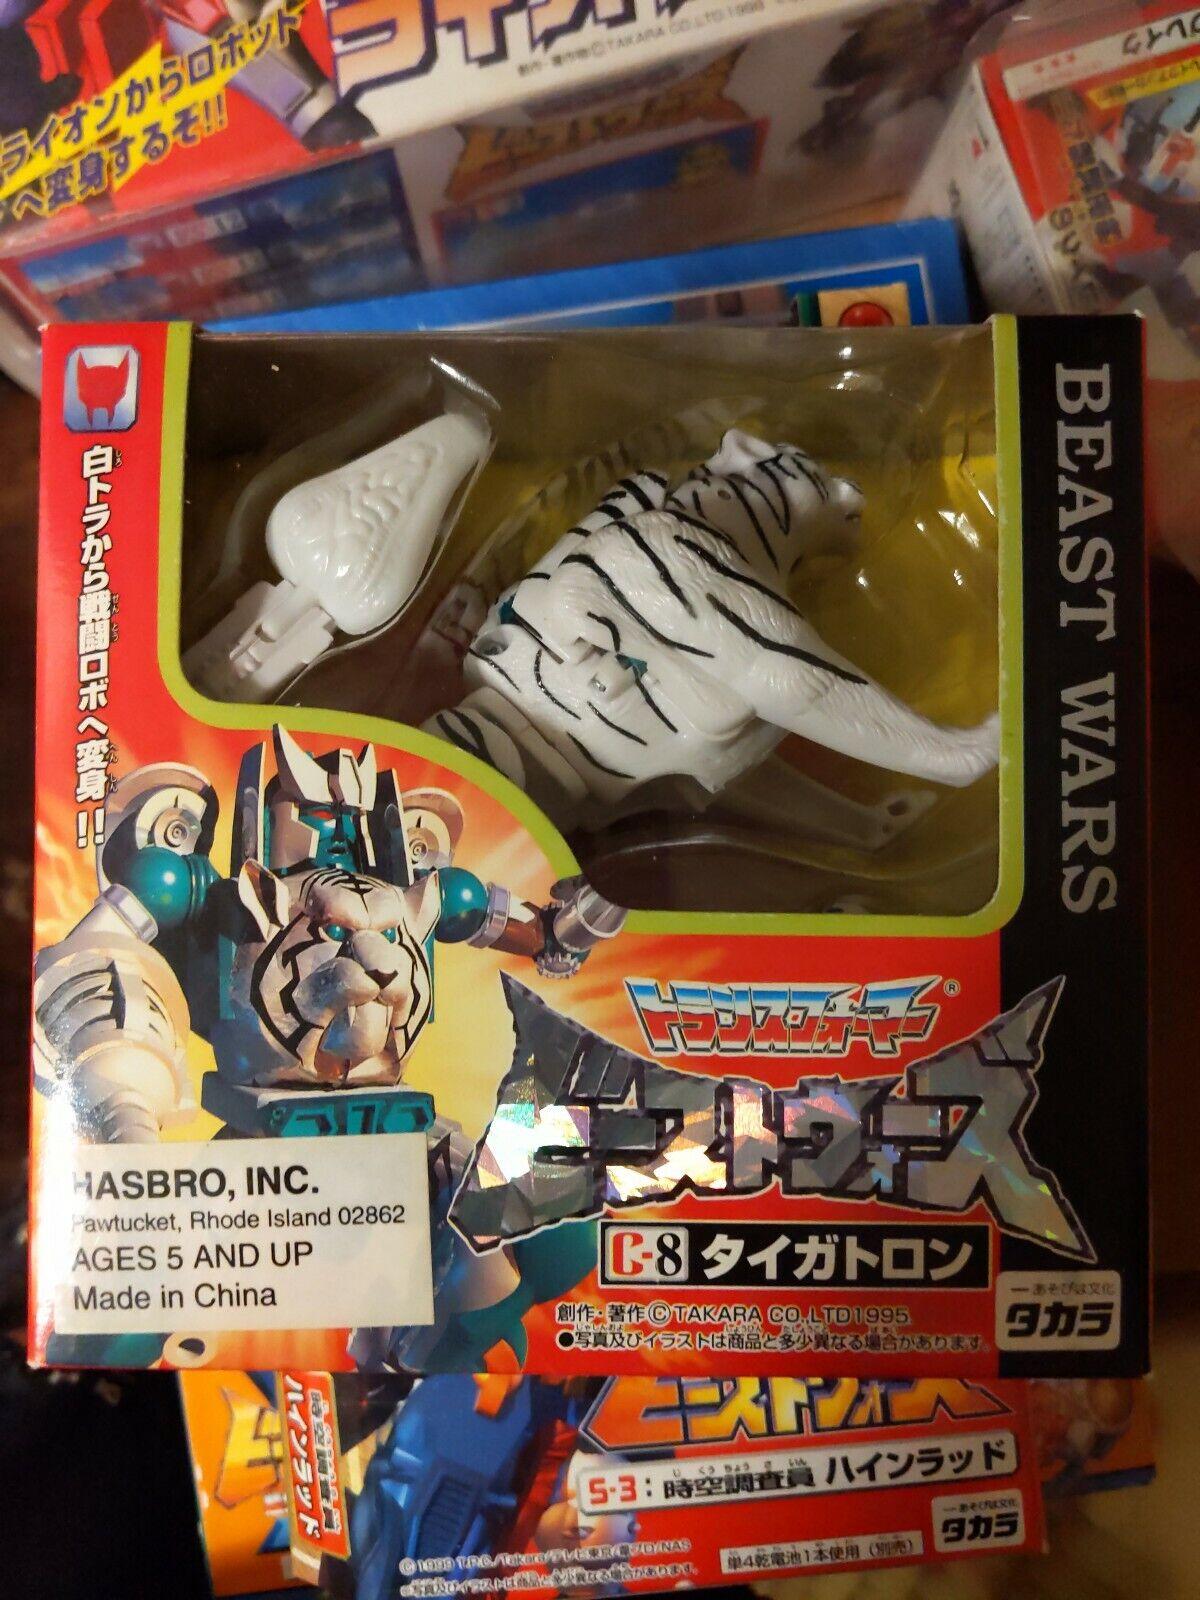 Transformers Transformers Transformers Beast Guerras Japan C-8 Tigatron MISB bb7da1